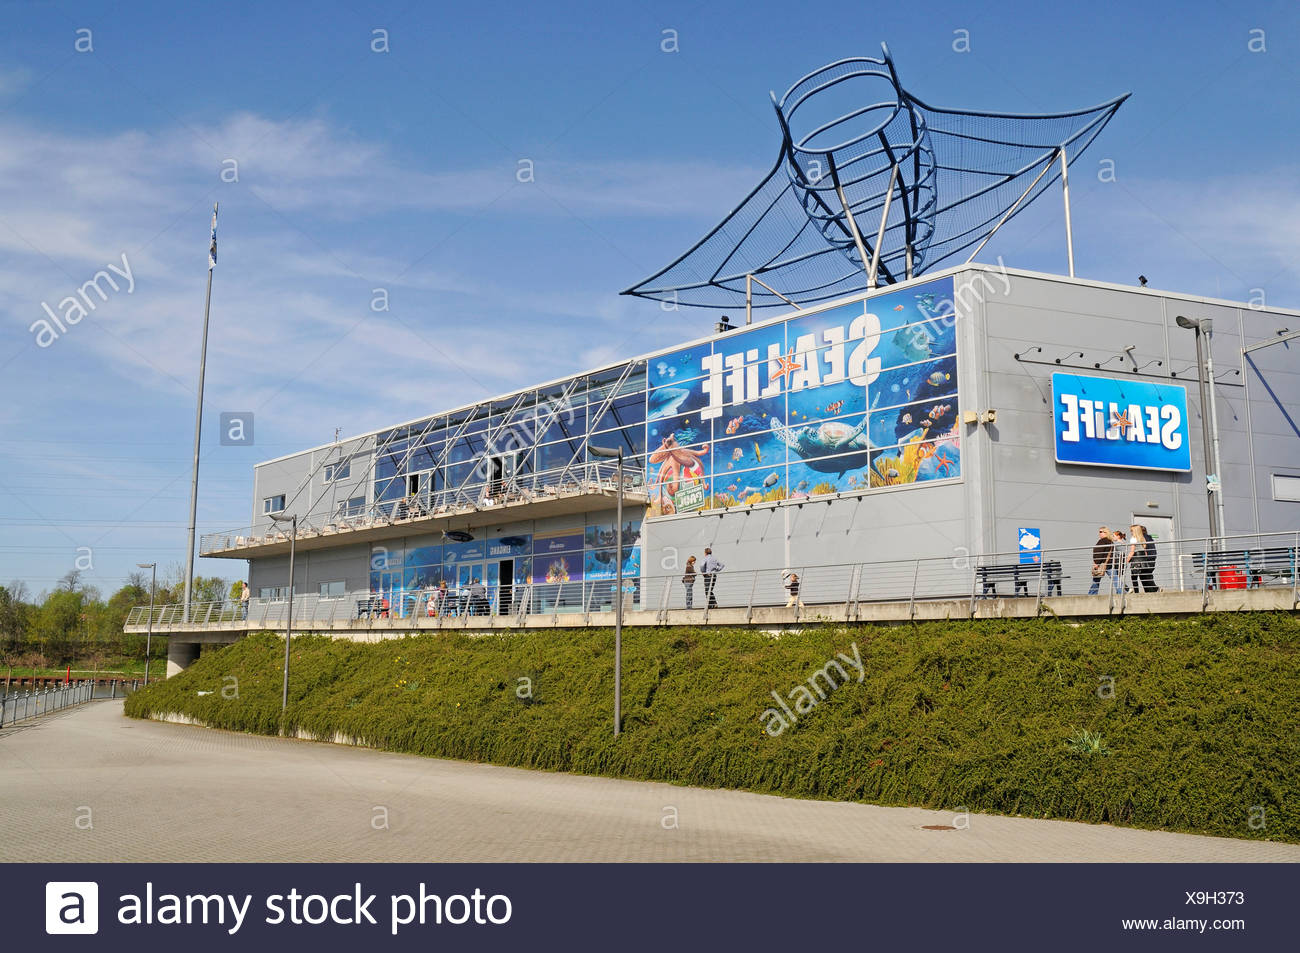 Sea Life, Sealife, fresh and salt water aquarium, shopping center, Neue Mitte district, Centro, Oberhausen, Ruhrgebiet area - Stock Image